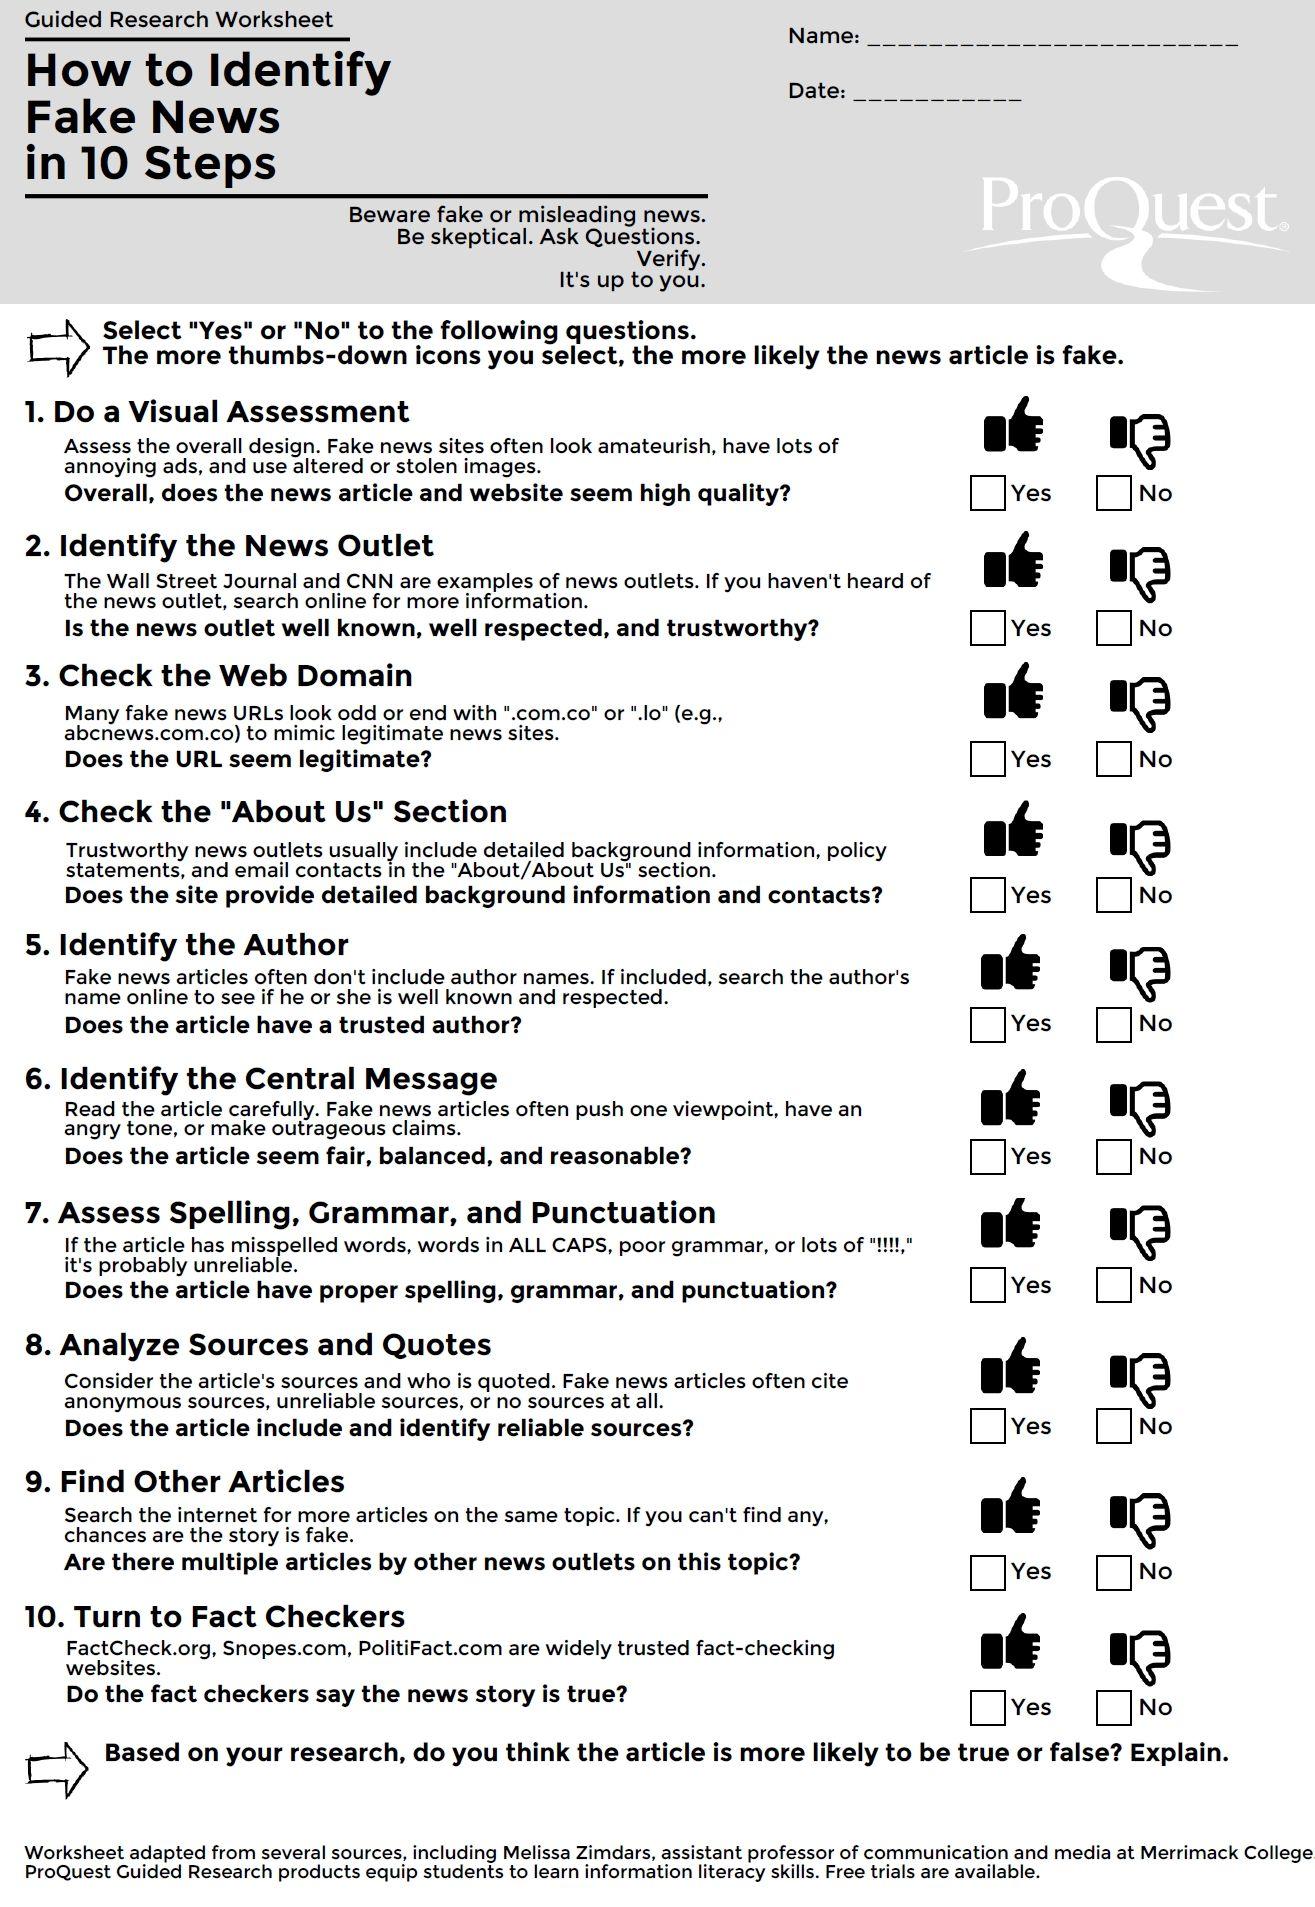 How To Identify Fake News In 10 Steps Fakenews Infolit Lessonplans Fake News Lessons Information Literacy Media Literacy